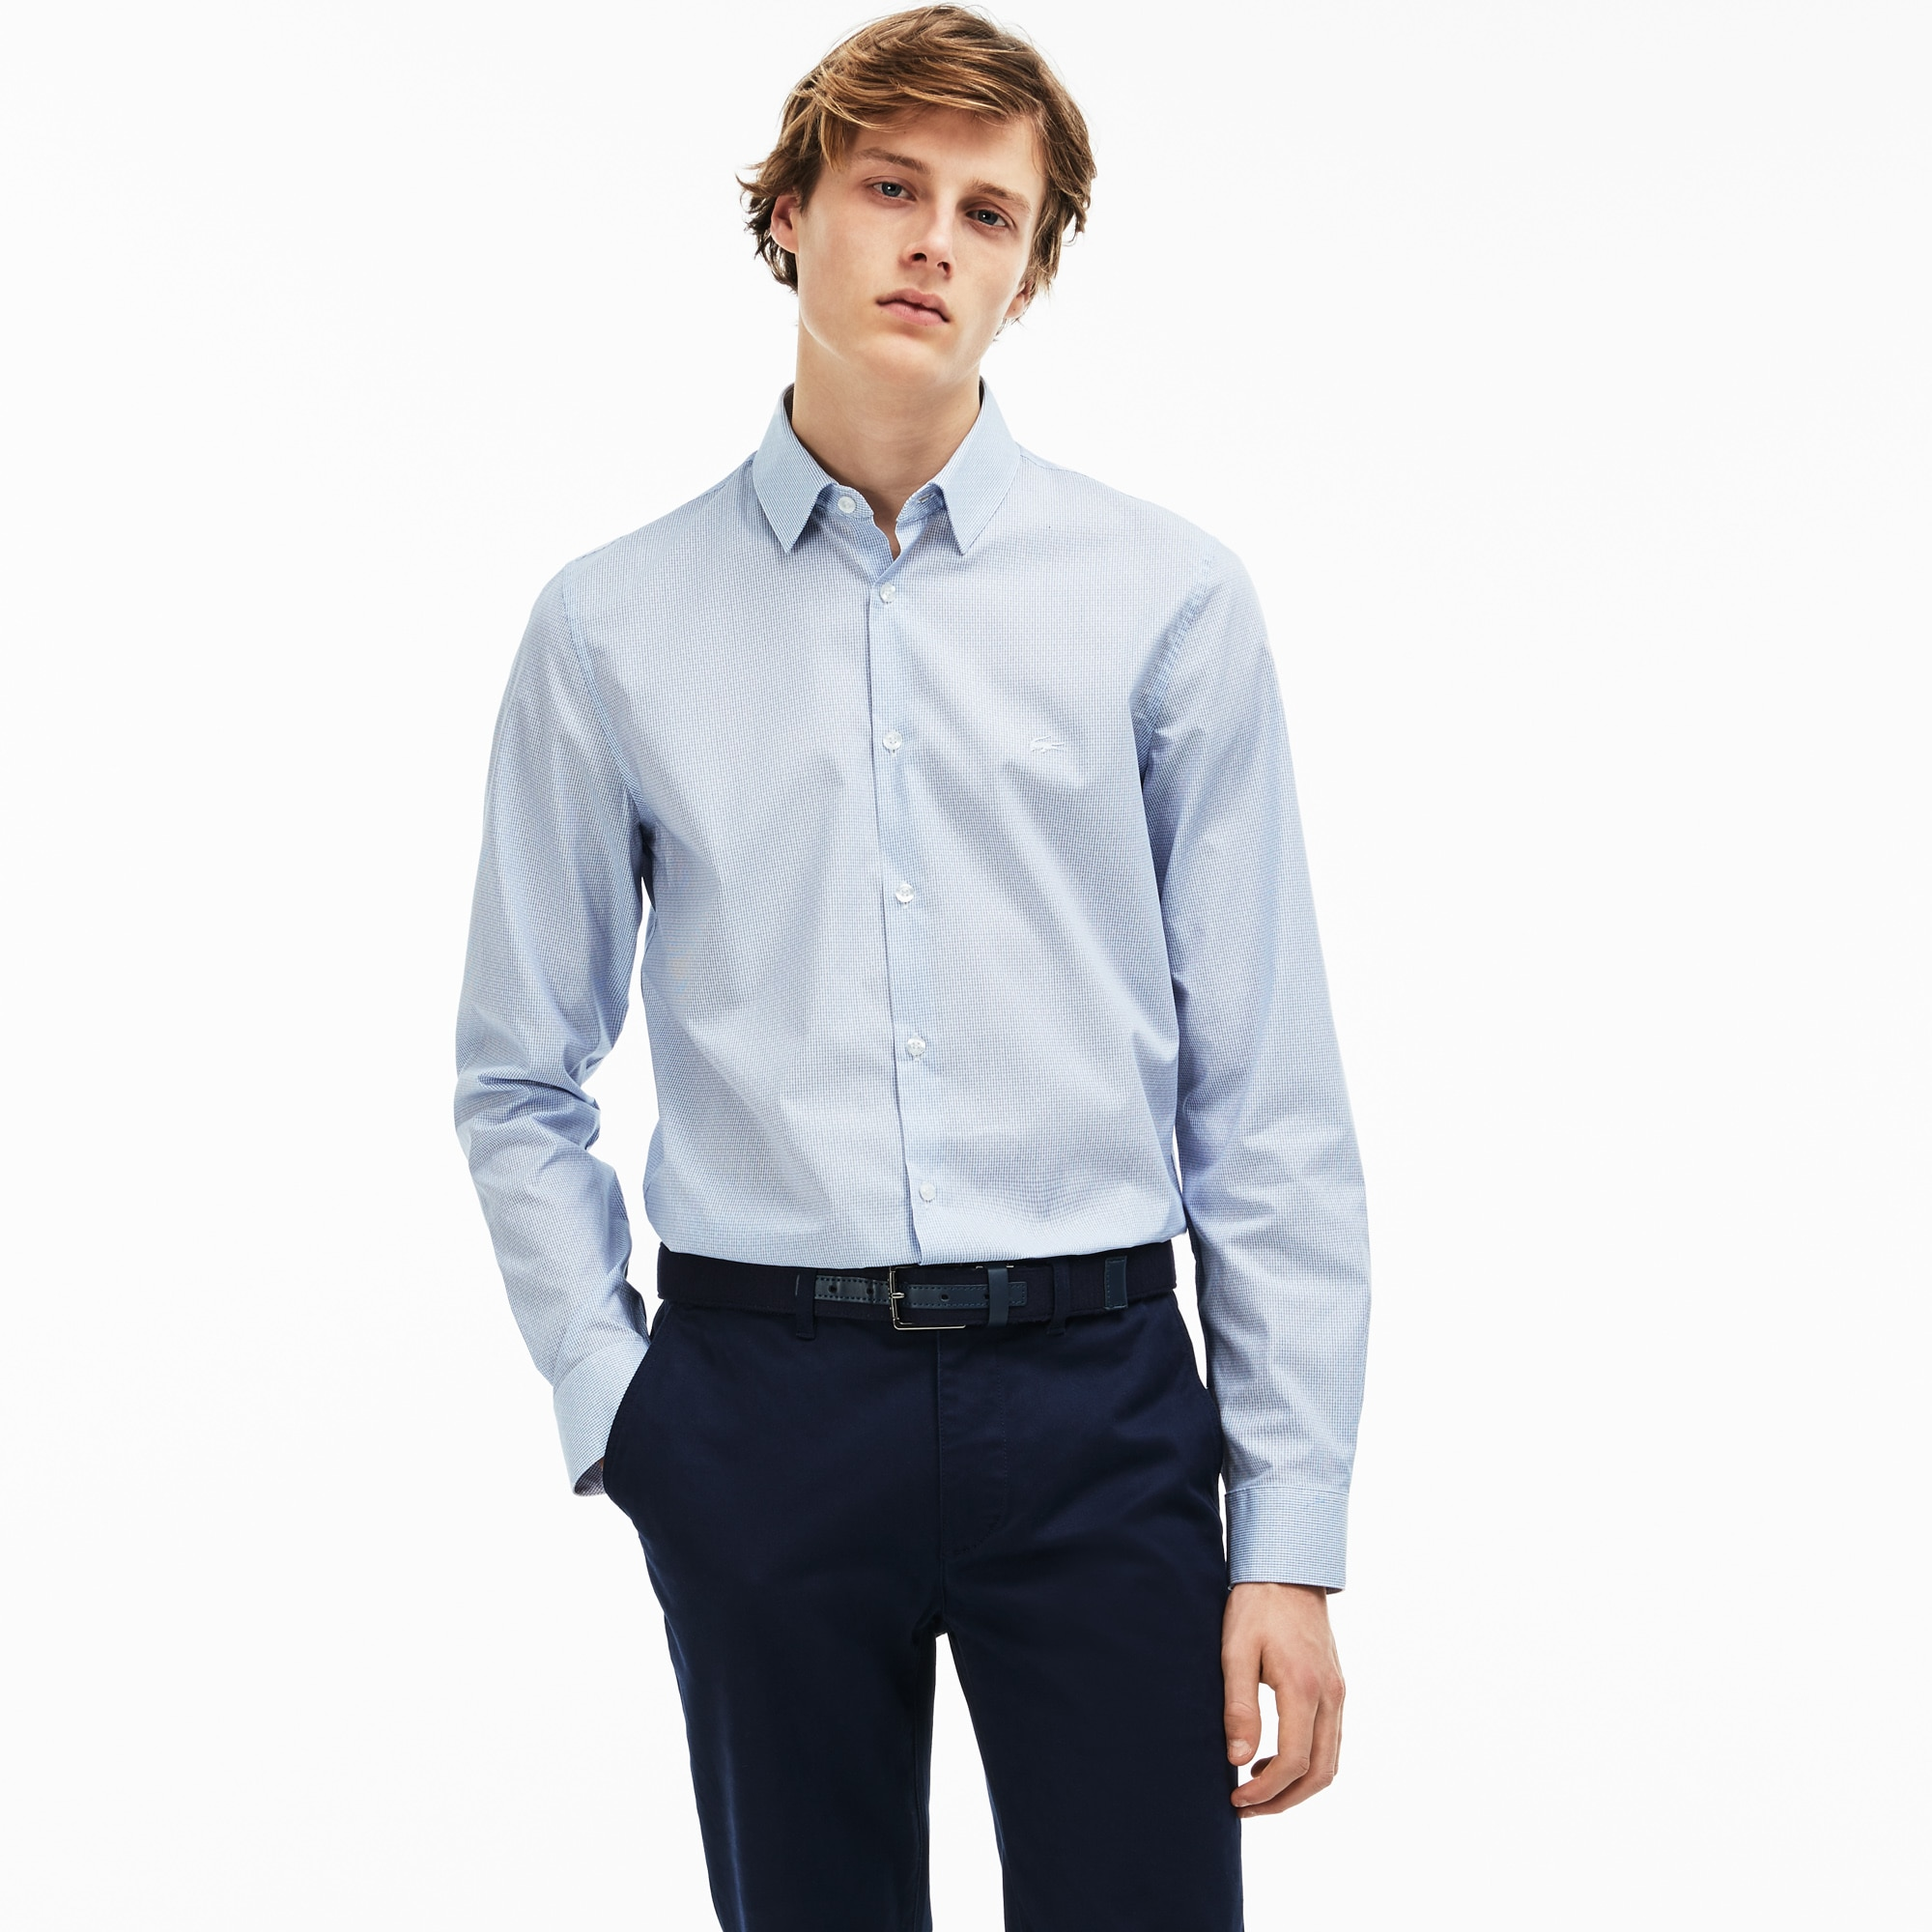 Men's Slim Fit Geometric Print Jacquard Poplin Shirt